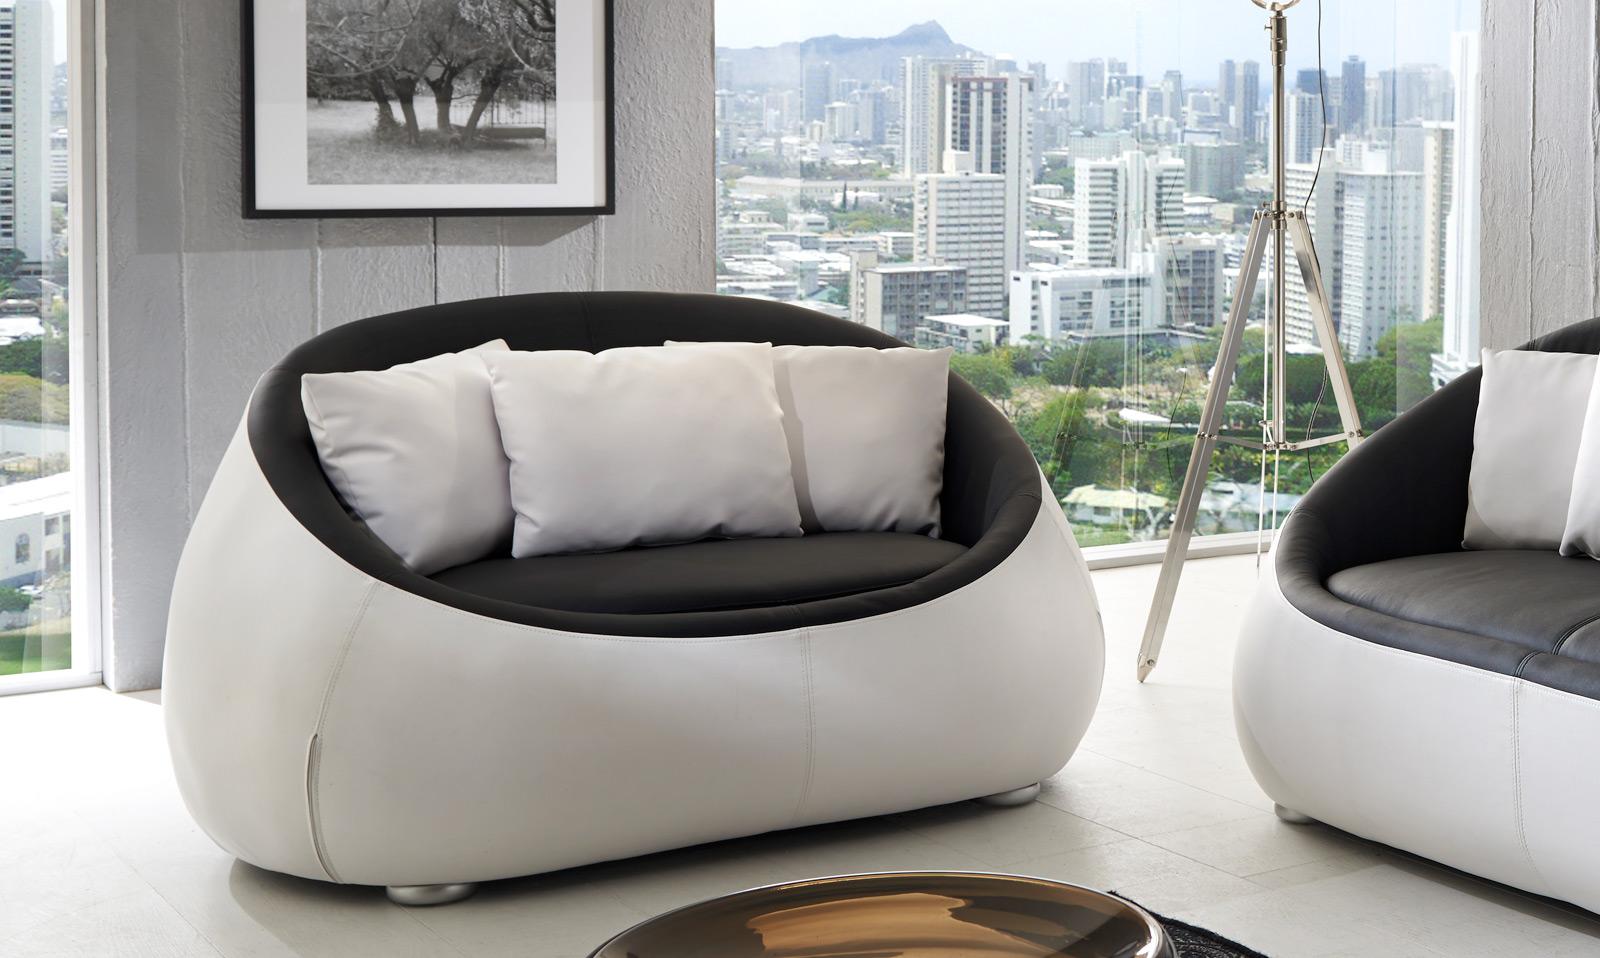 sam design sofa schwarz wei couch 2 sitzer rondo. Black Bedroom Furniture Sets. Home Design Ideas